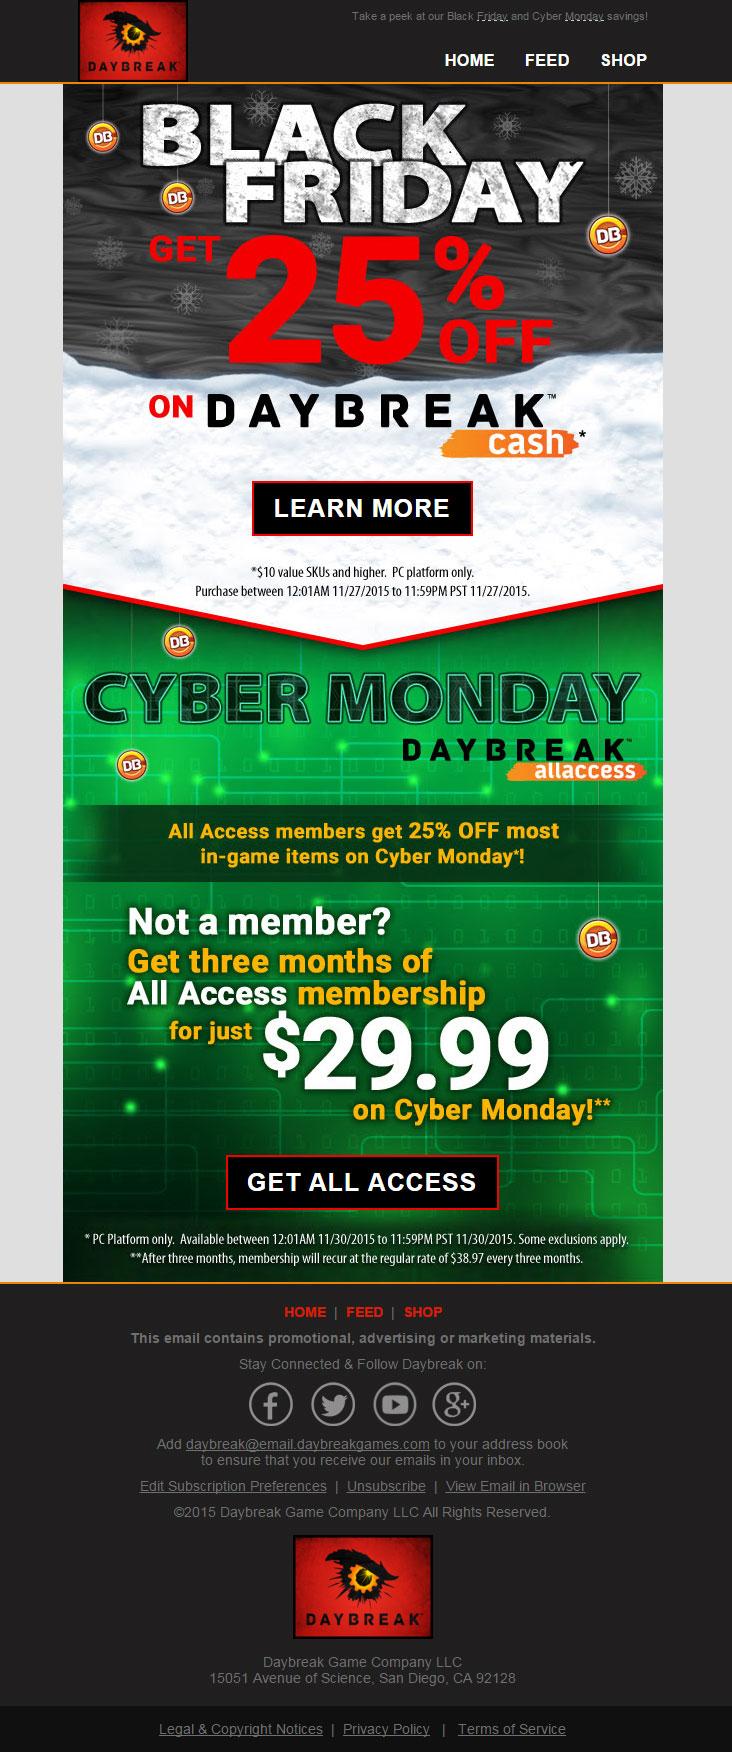 EQ2Wire » Daybreak Games Black Friday/Cyber Monday Details